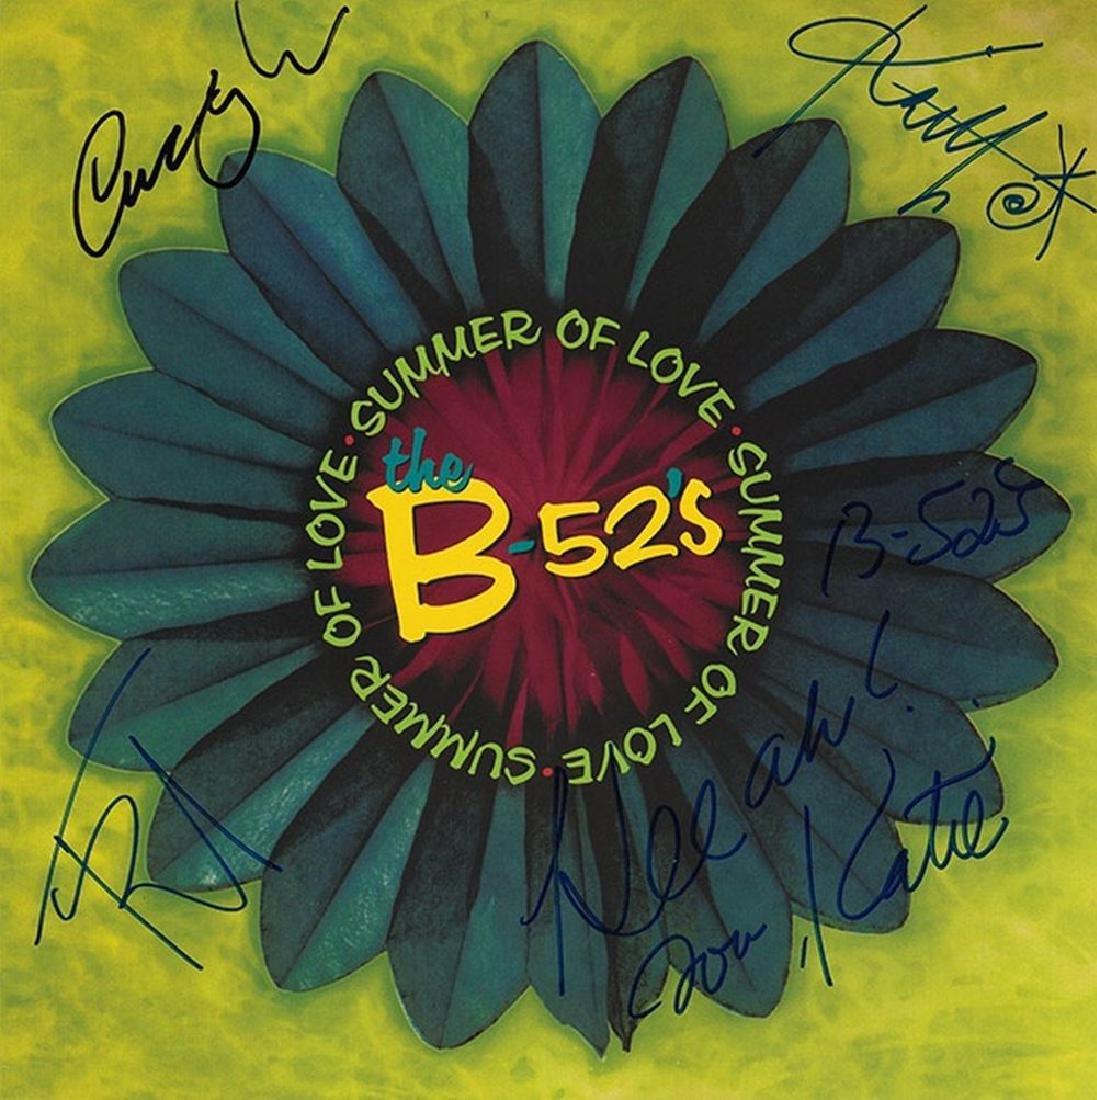 "B52s ""Summer Of Love"" Signed Album"